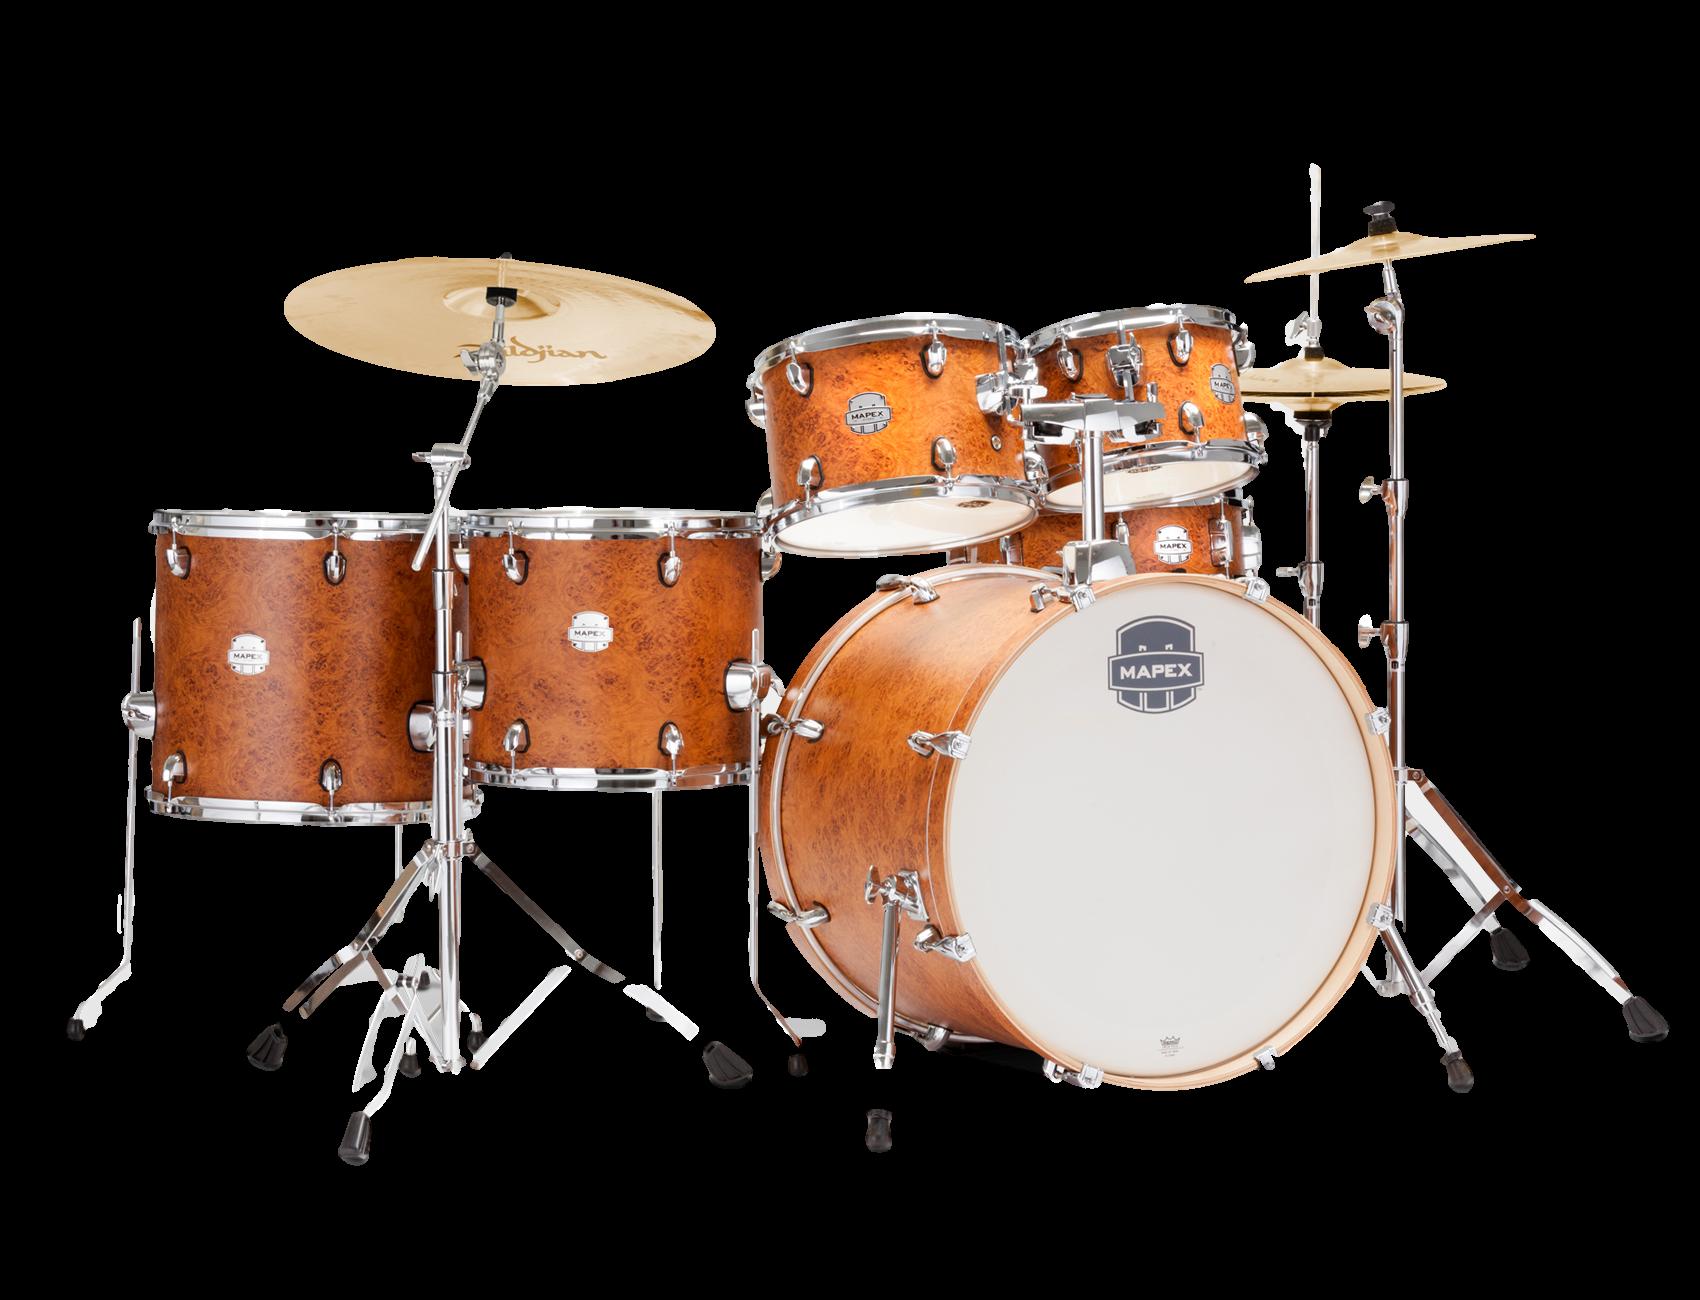 Mapex 6pc Kit W/Ziljdian Cymbals